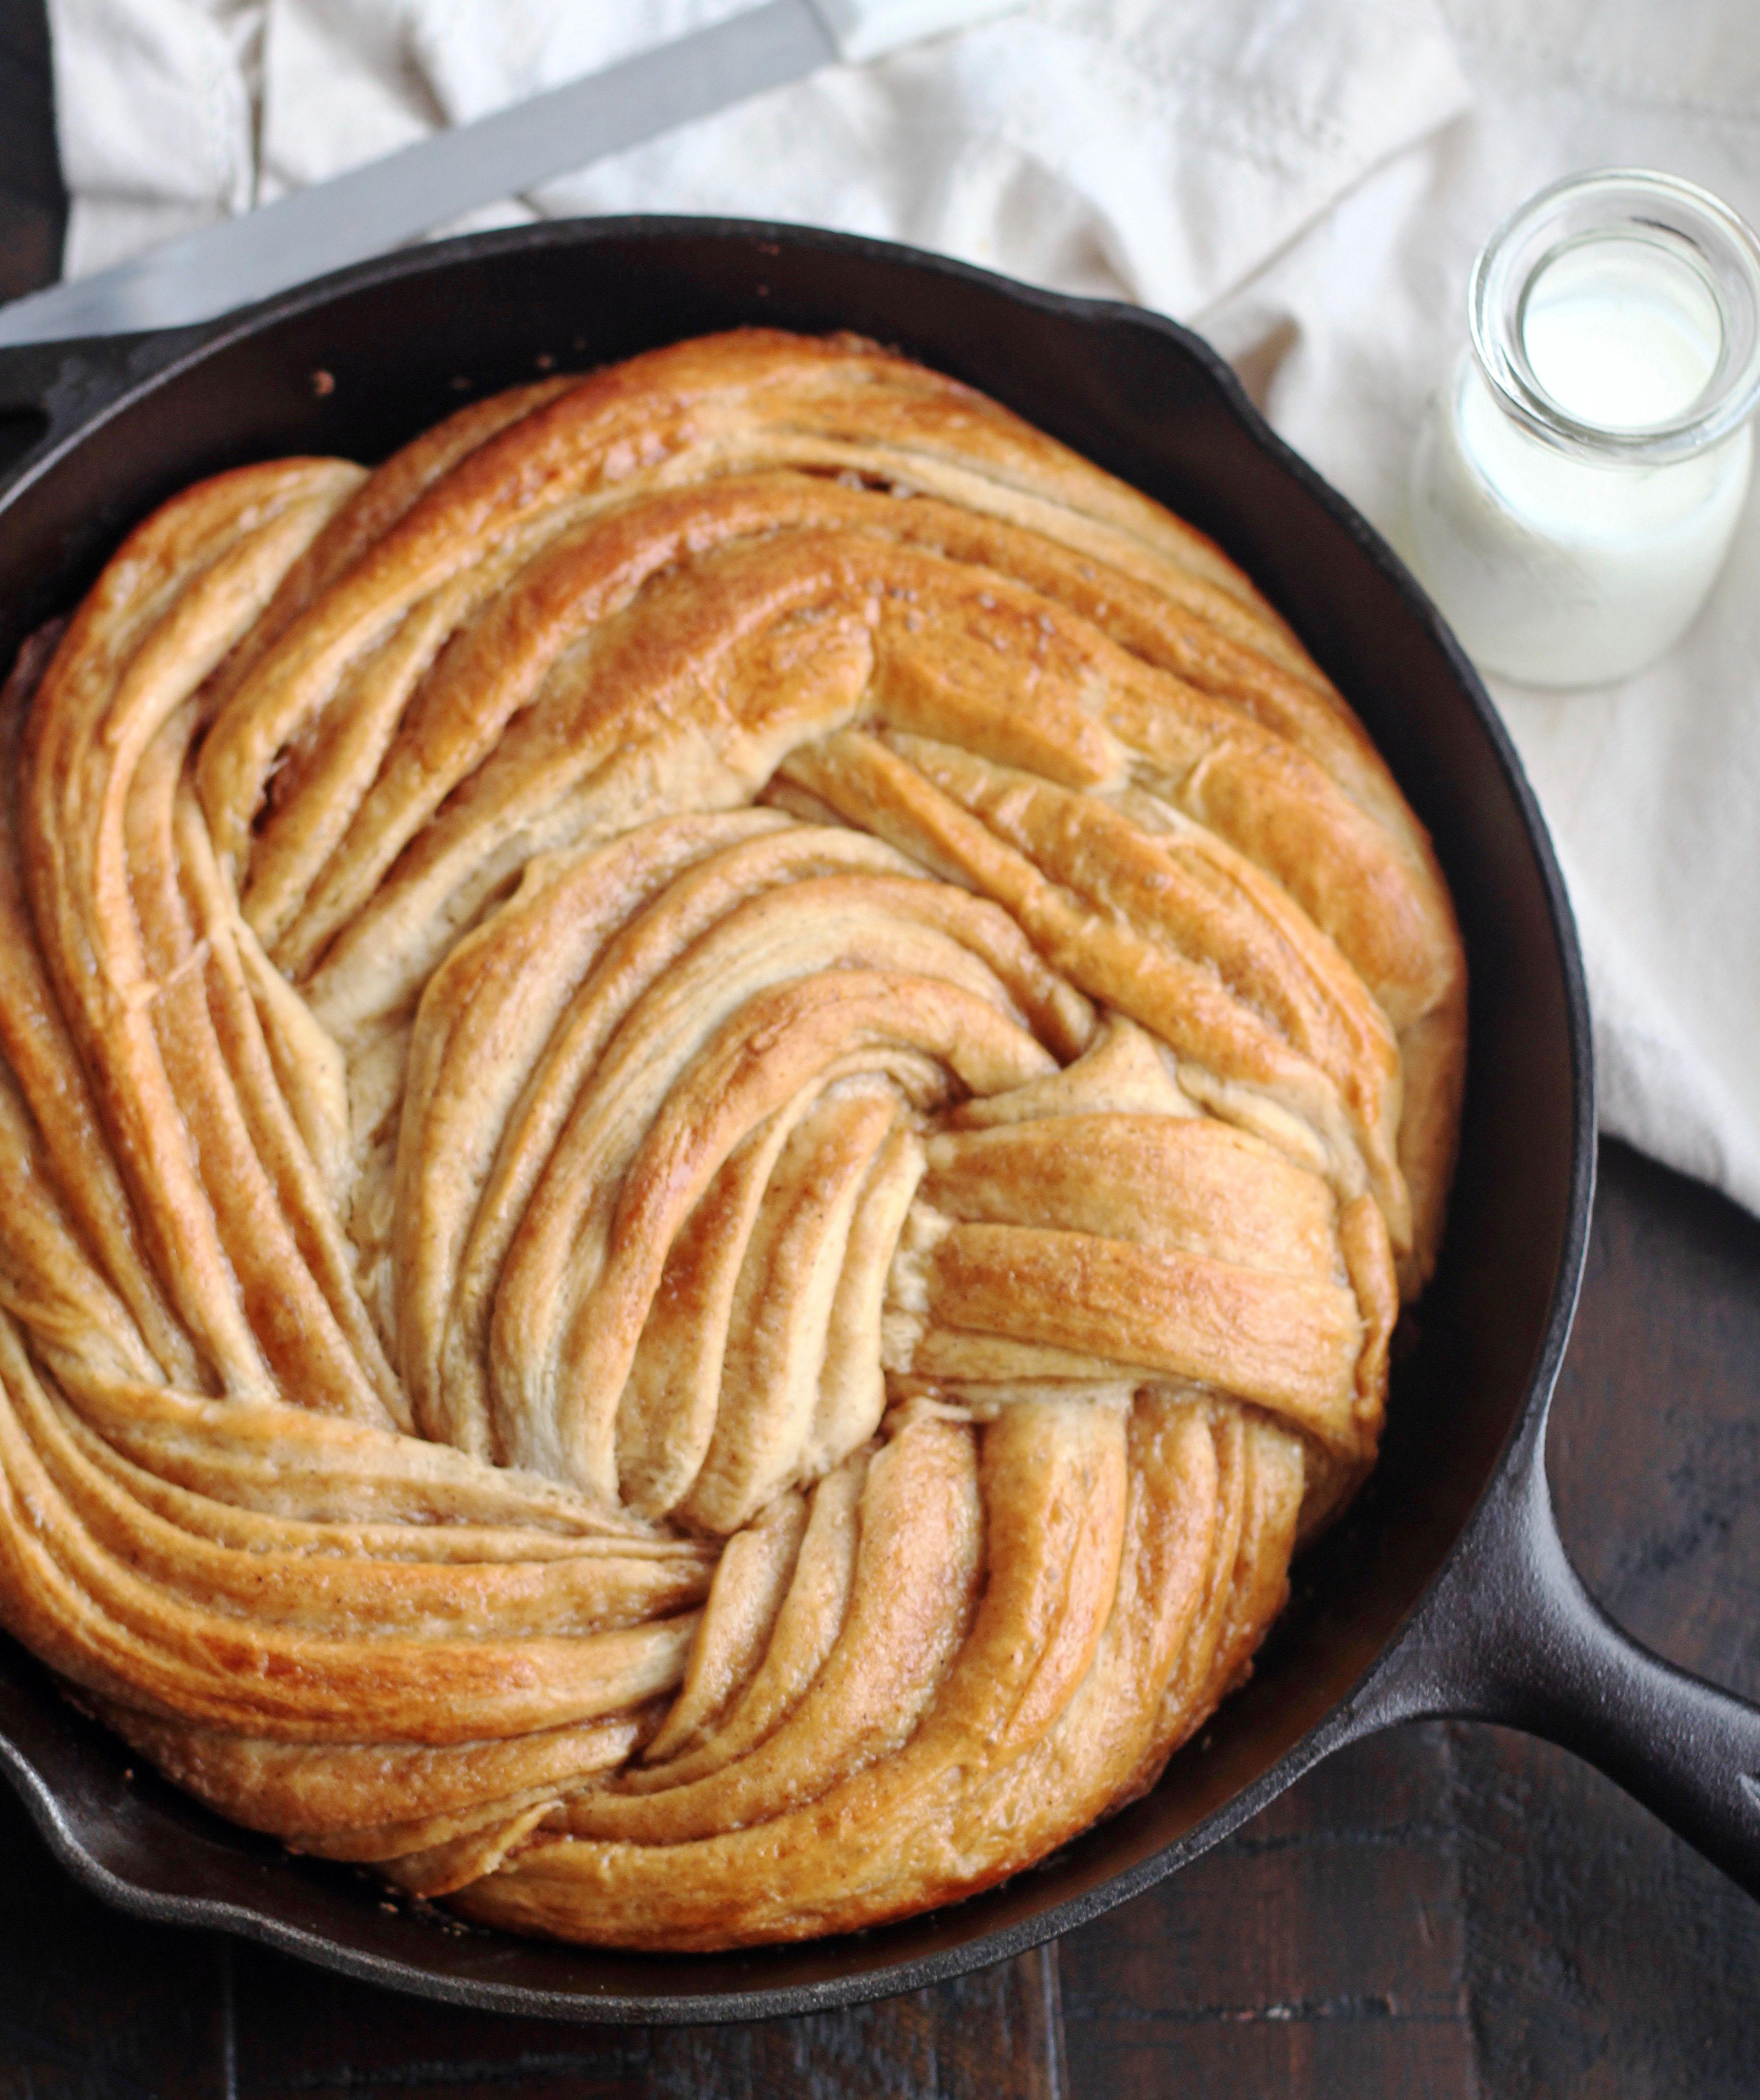 Cinnamon Swirl Bread 5 Boys Baker